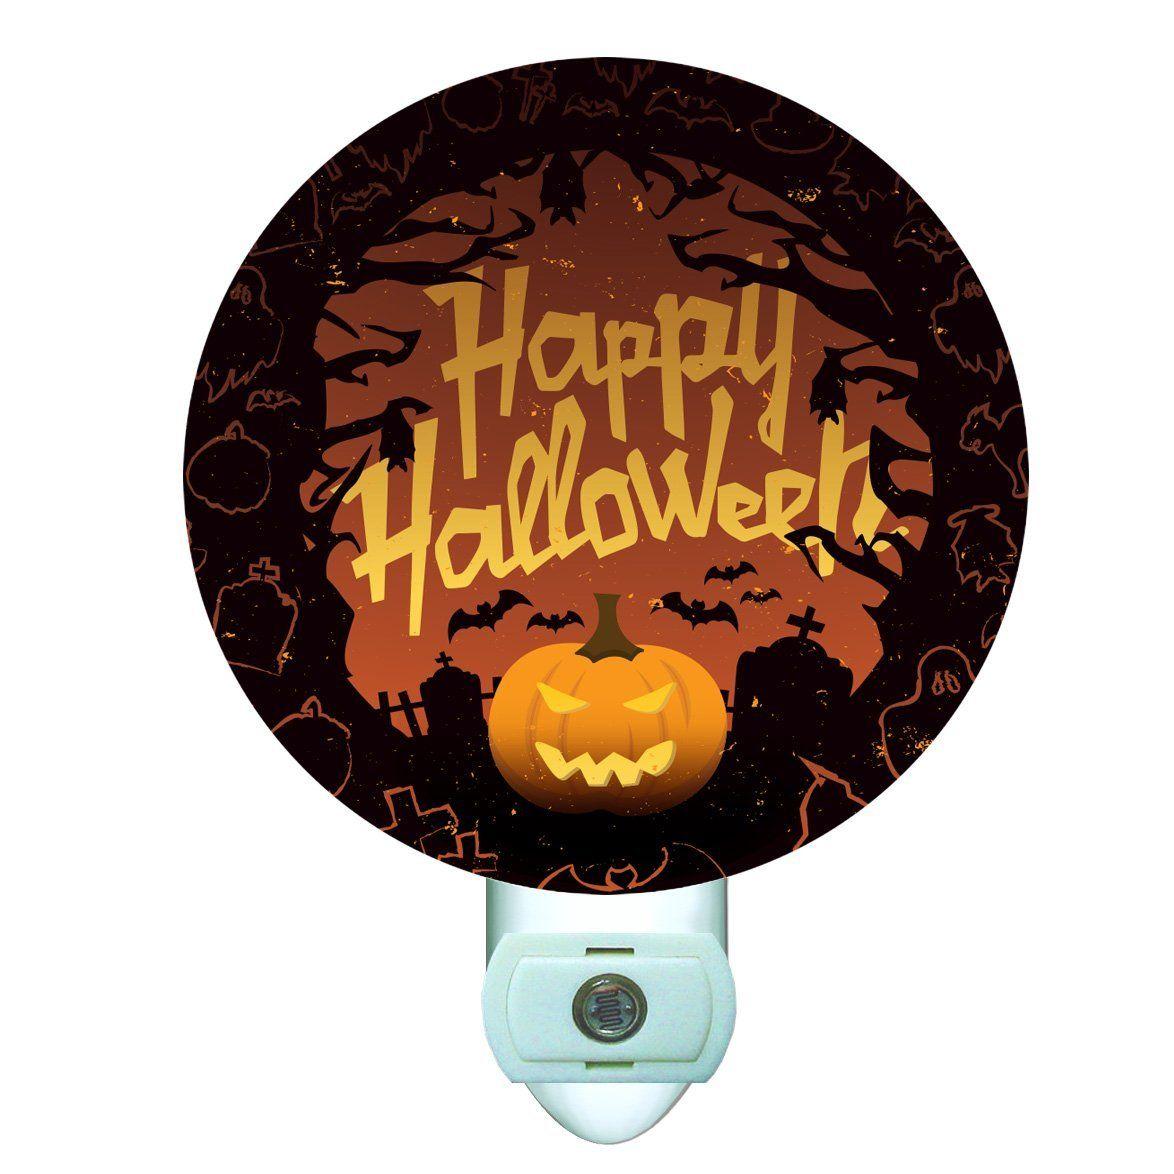 Happy Halloween Decorative Round Night Light